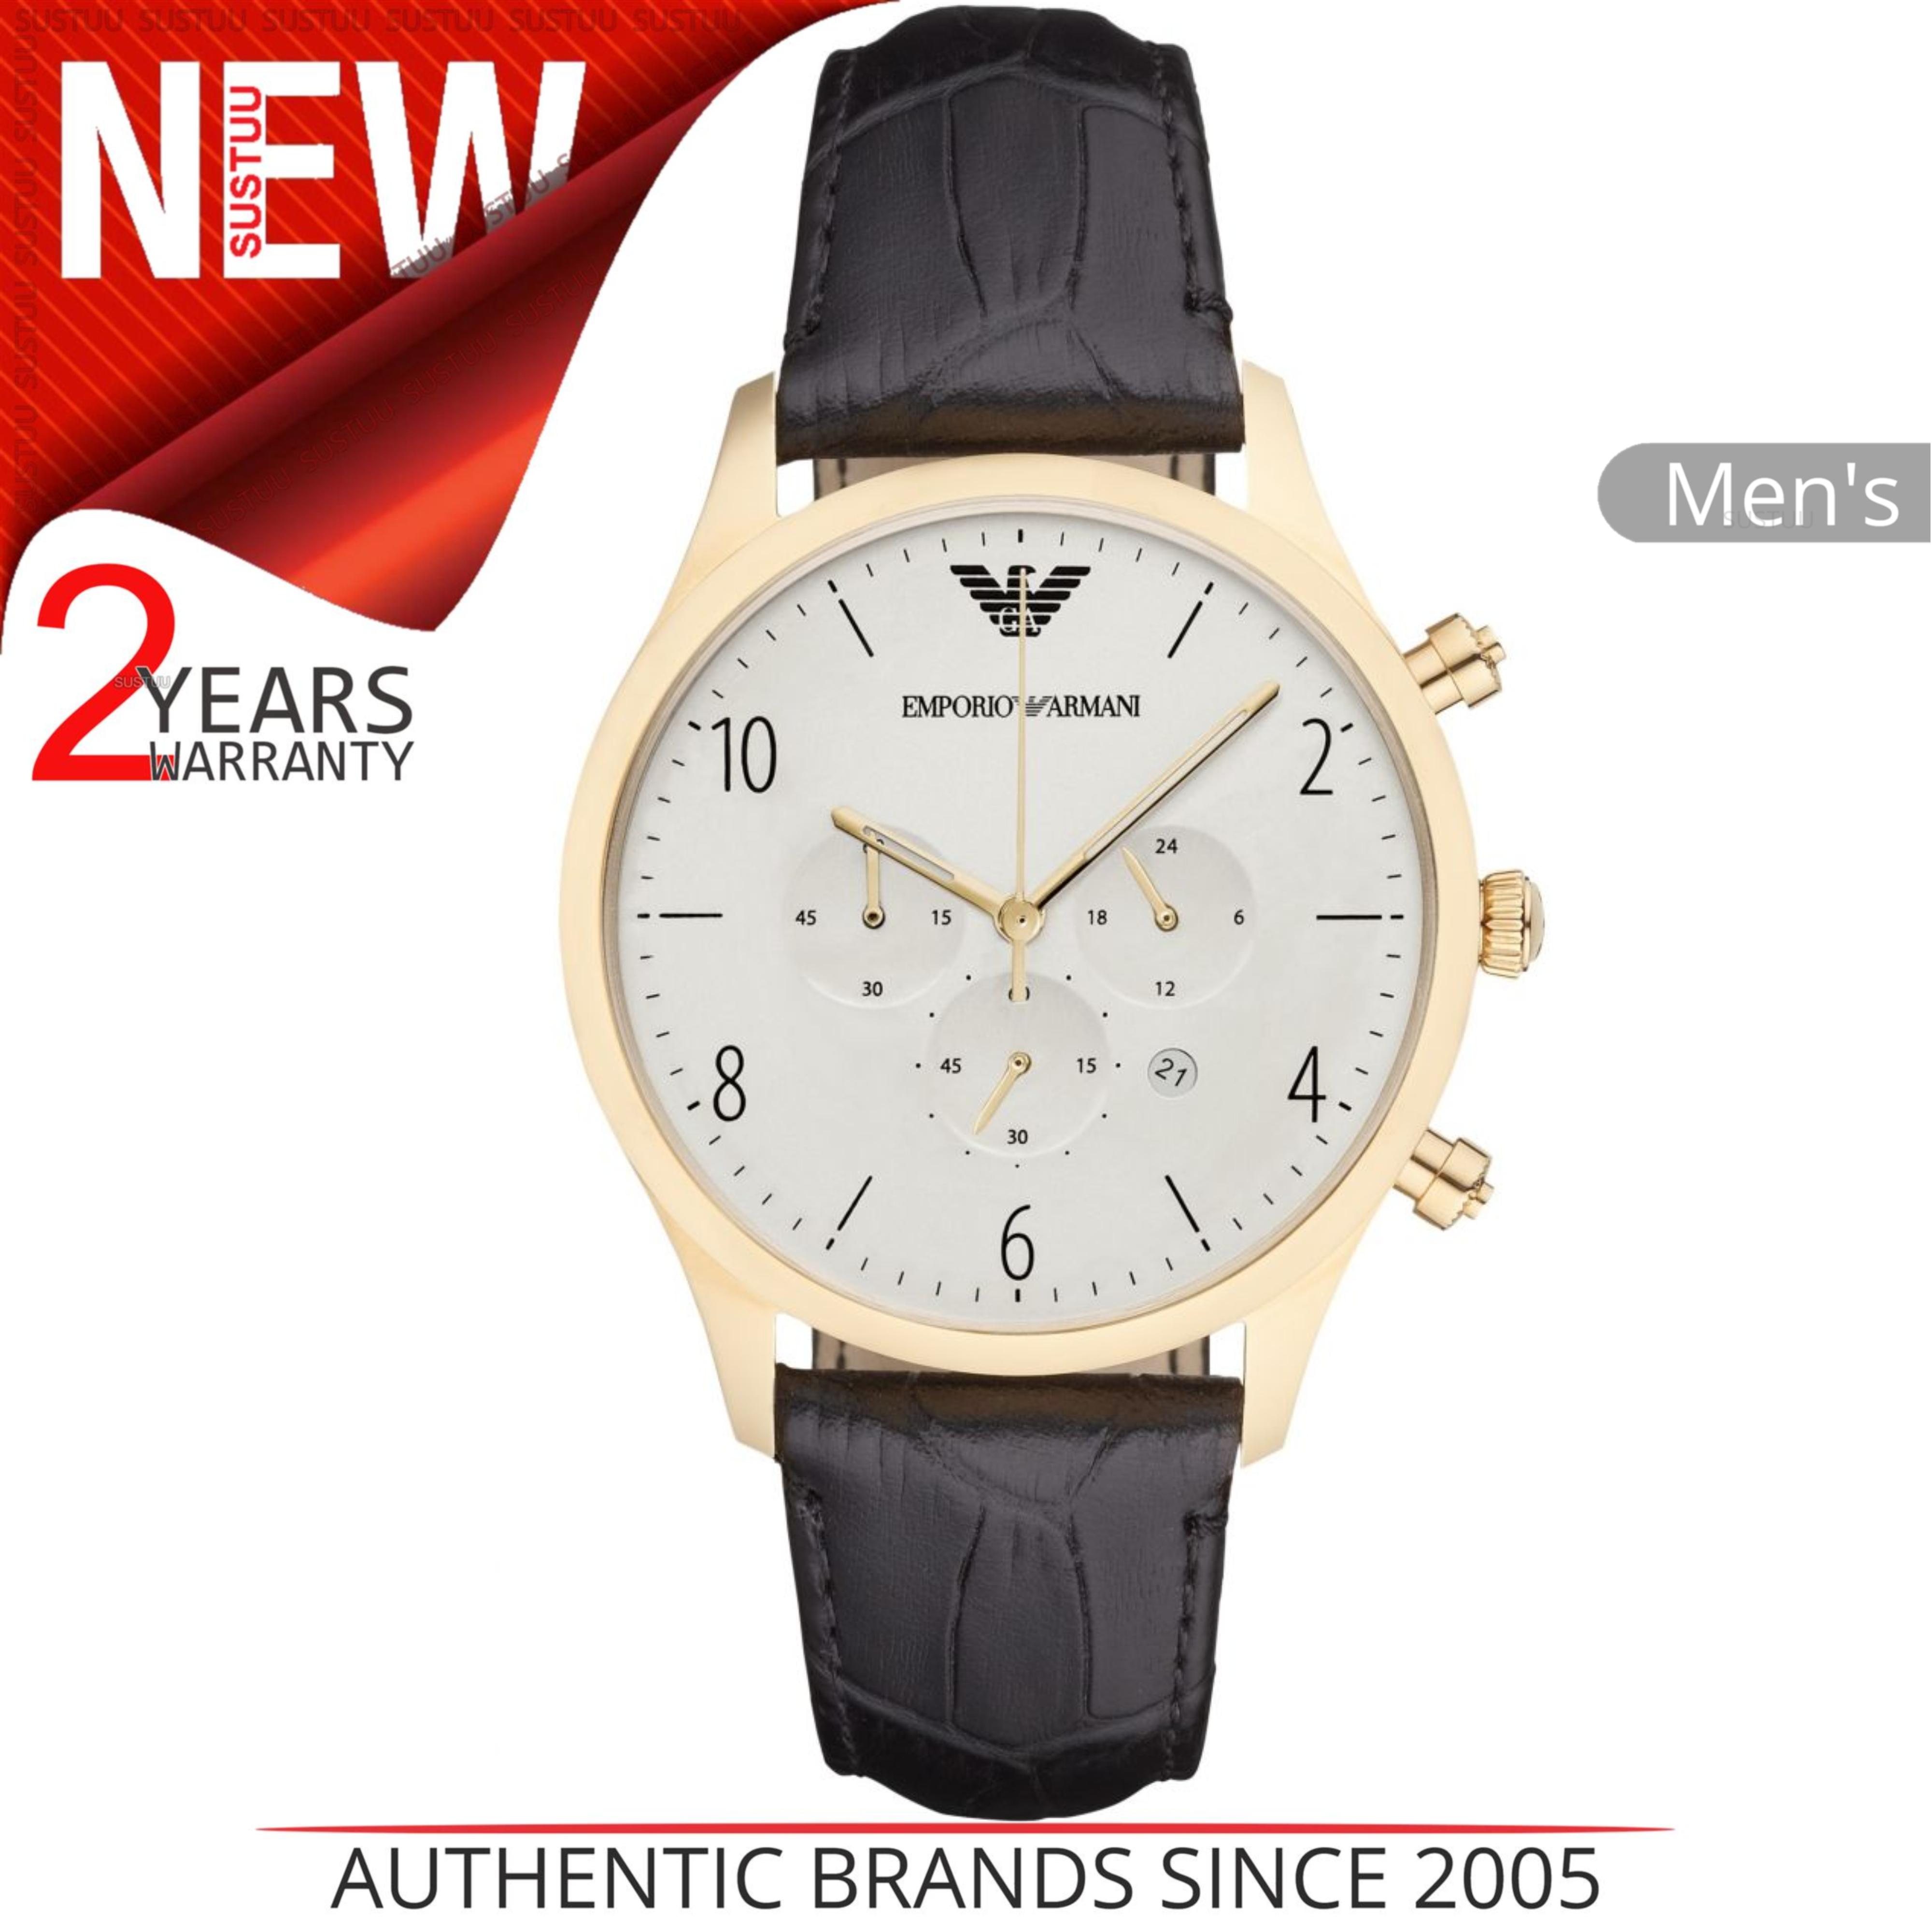 b9632c587492 CENTINELA Reloj Emporio Armani Classic para hombre AR1892 │ Dial blanco  crono │ Correa de cuero negro